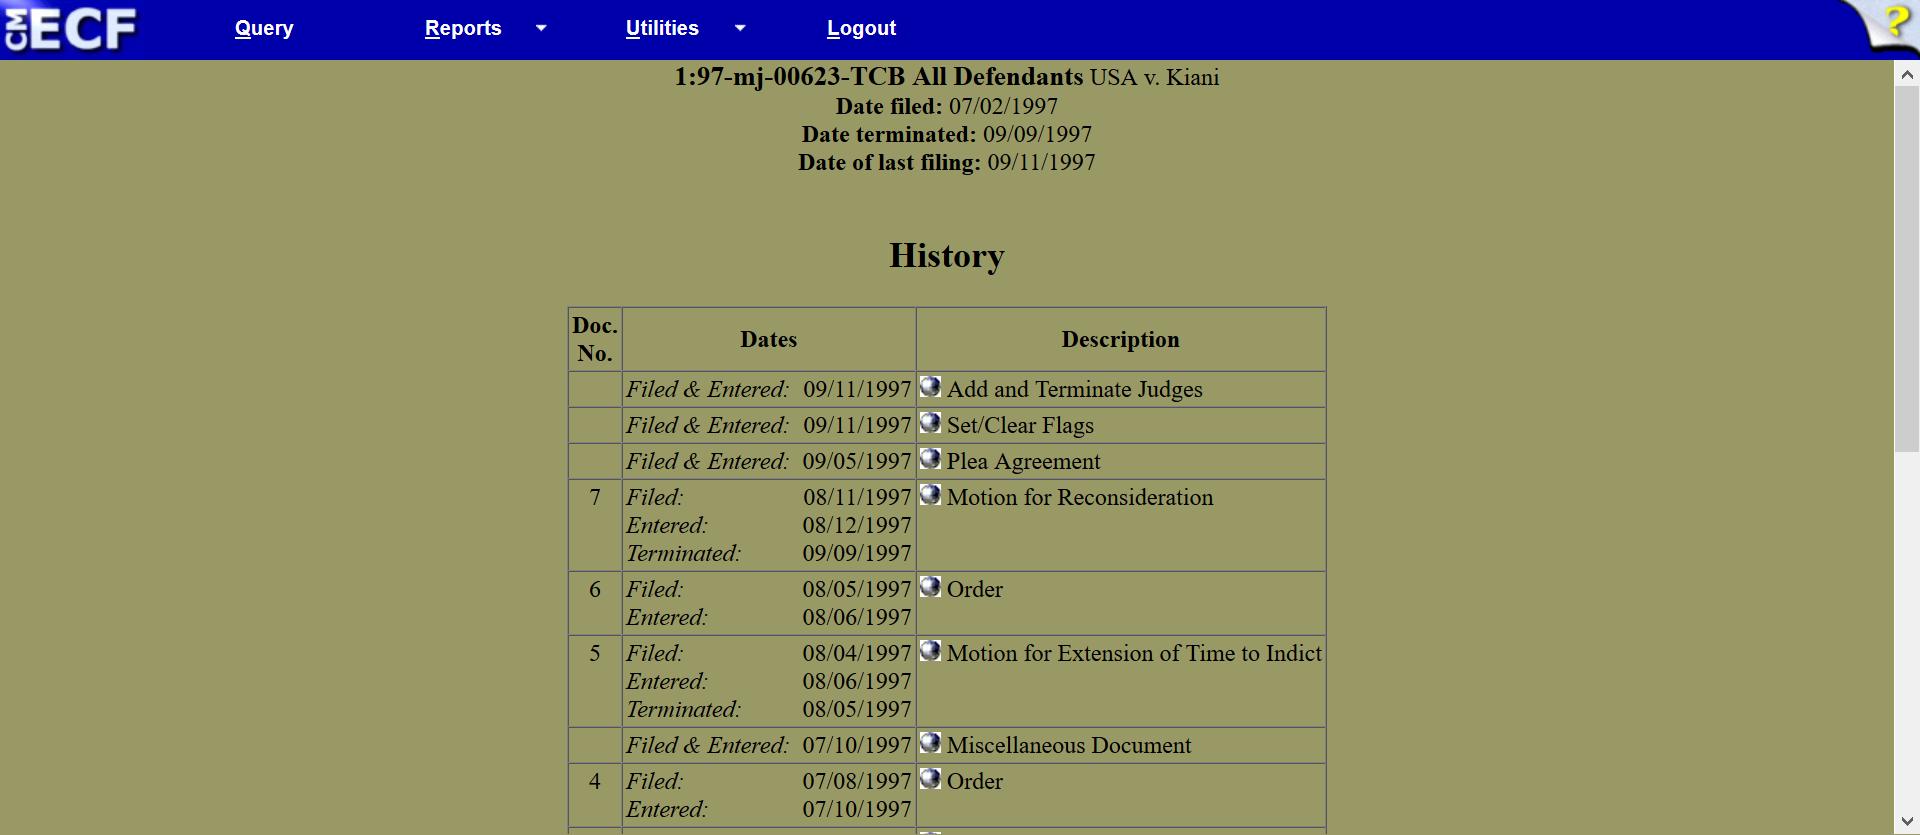 Kian 1997 case docket top.png